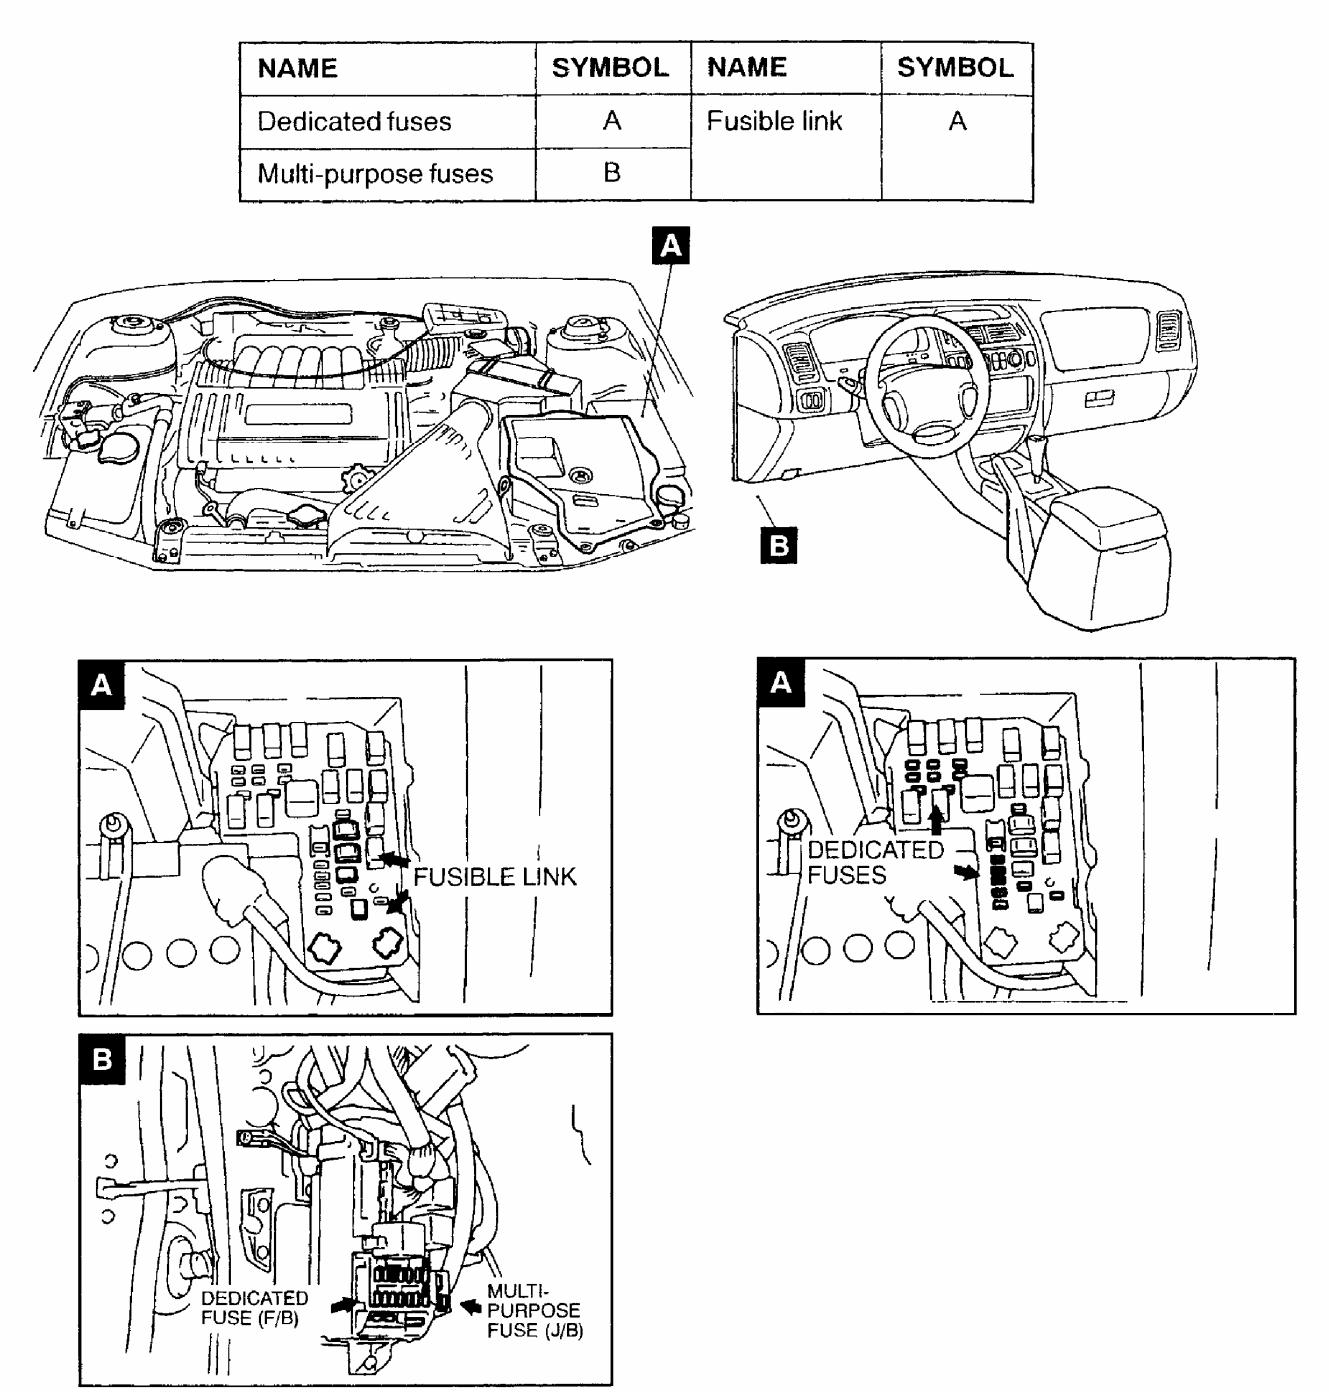 2001 Mitsubishi Diamante Engine Diagram -2004 Ford F350 Diesel Fuse Box  Diagram | Begeboy Wiring Diagram SourceBegeboy Wiring Diagram Source